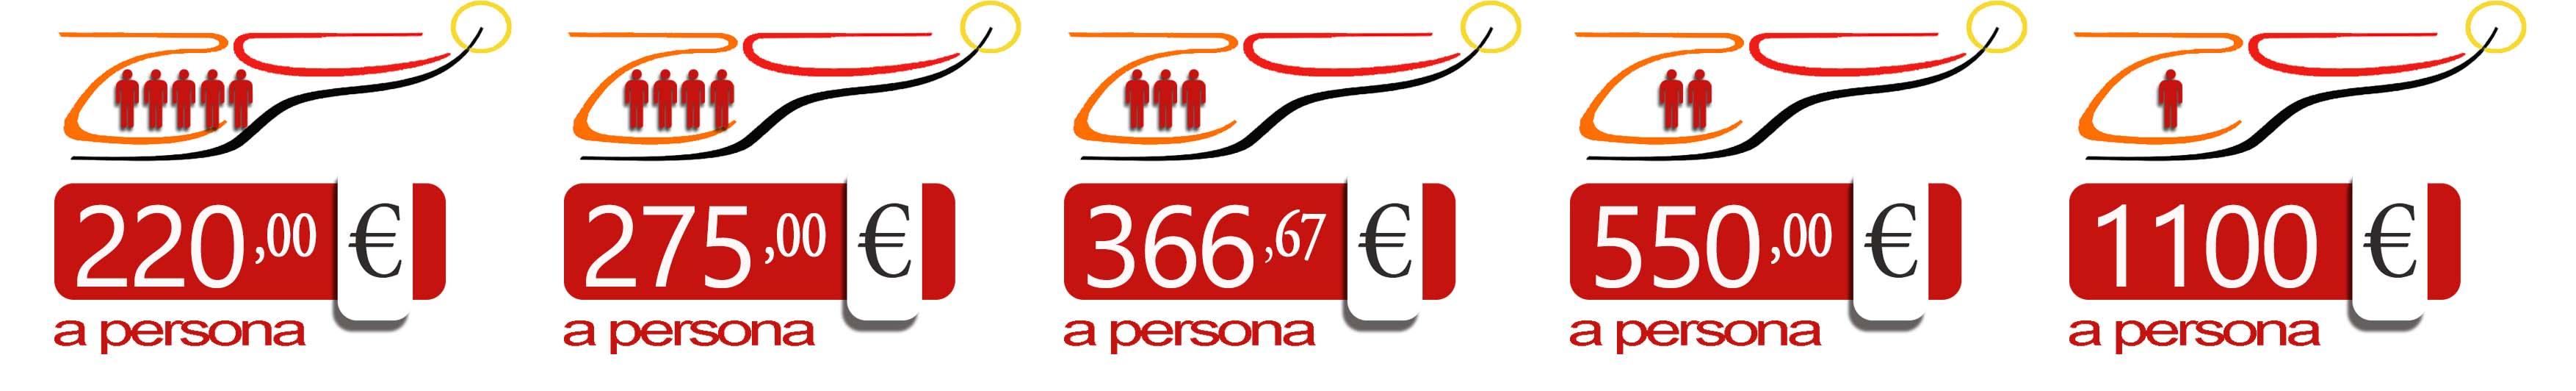 LISTINO_€ 220